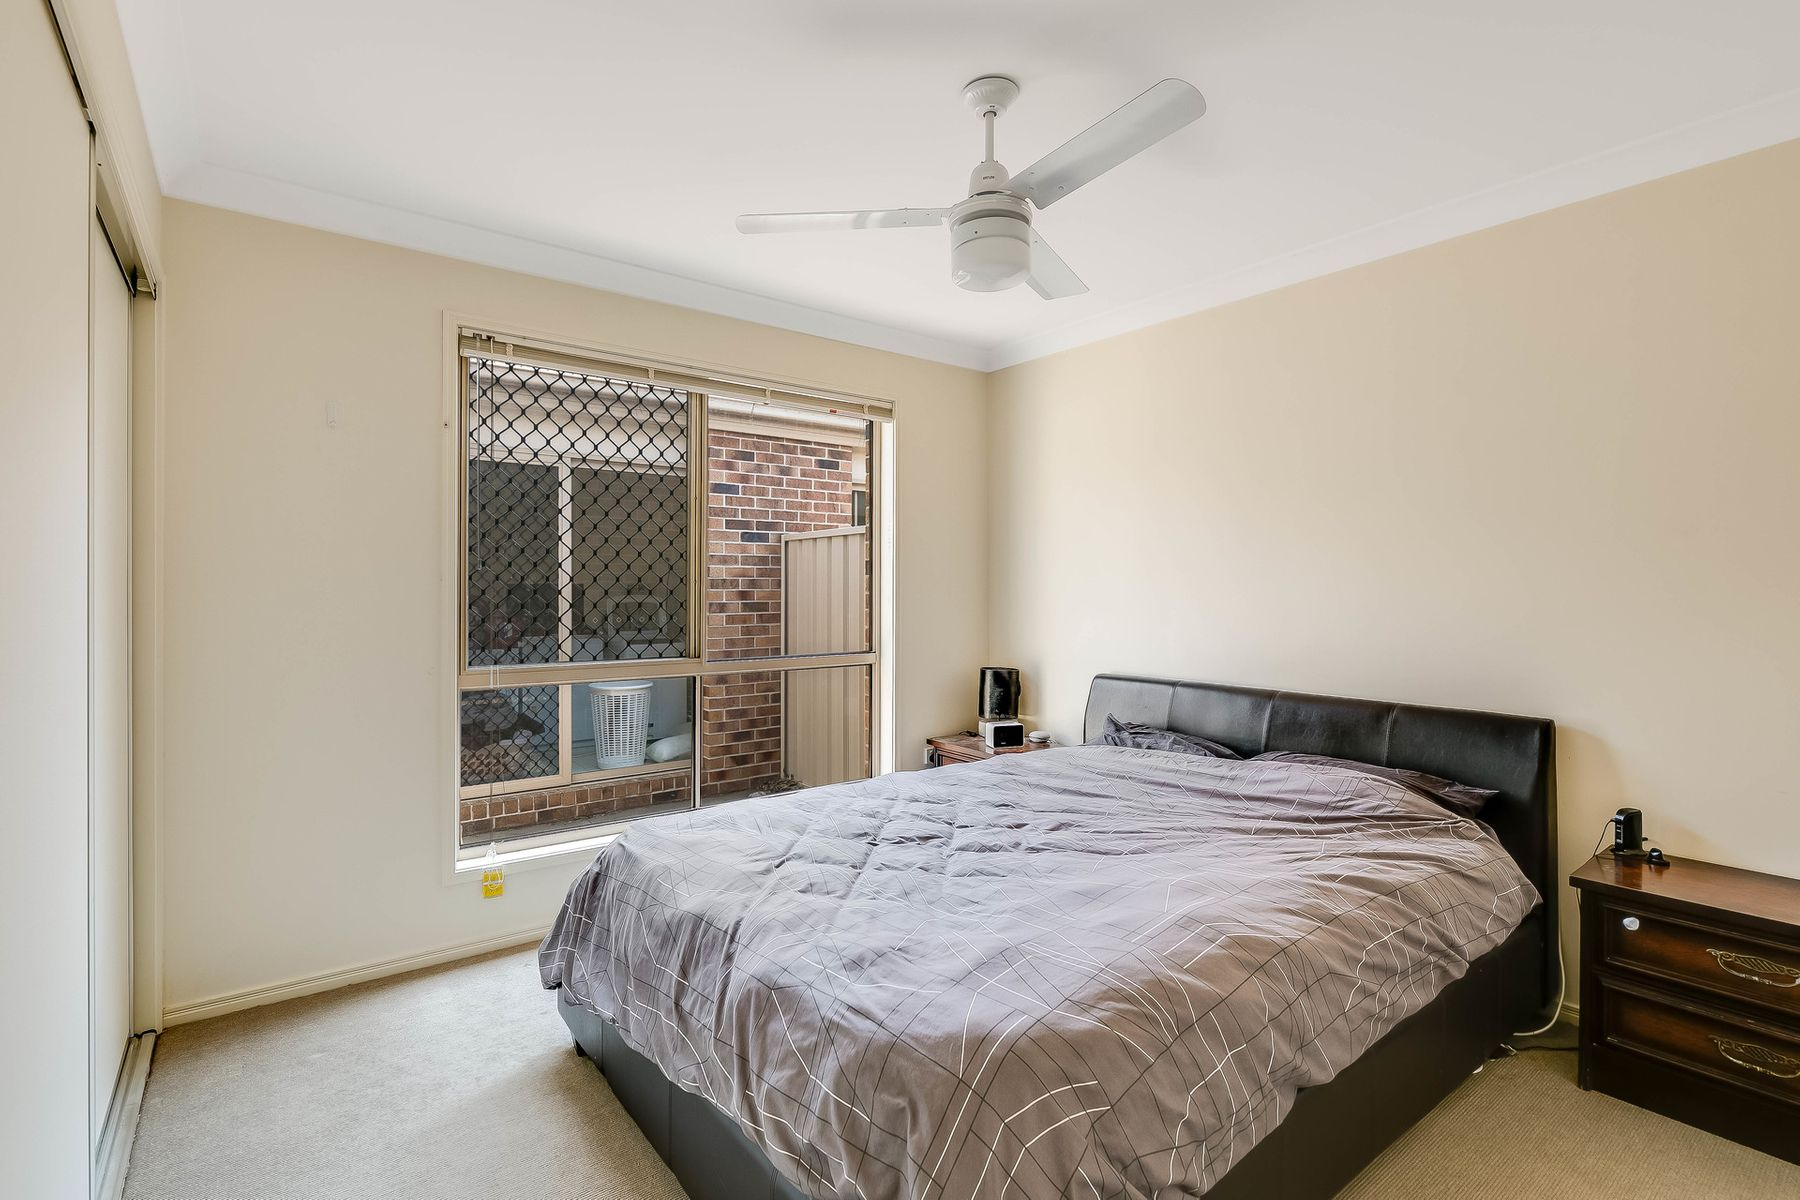 5/34 Gordon Avenue, Newtown, QLD 4305